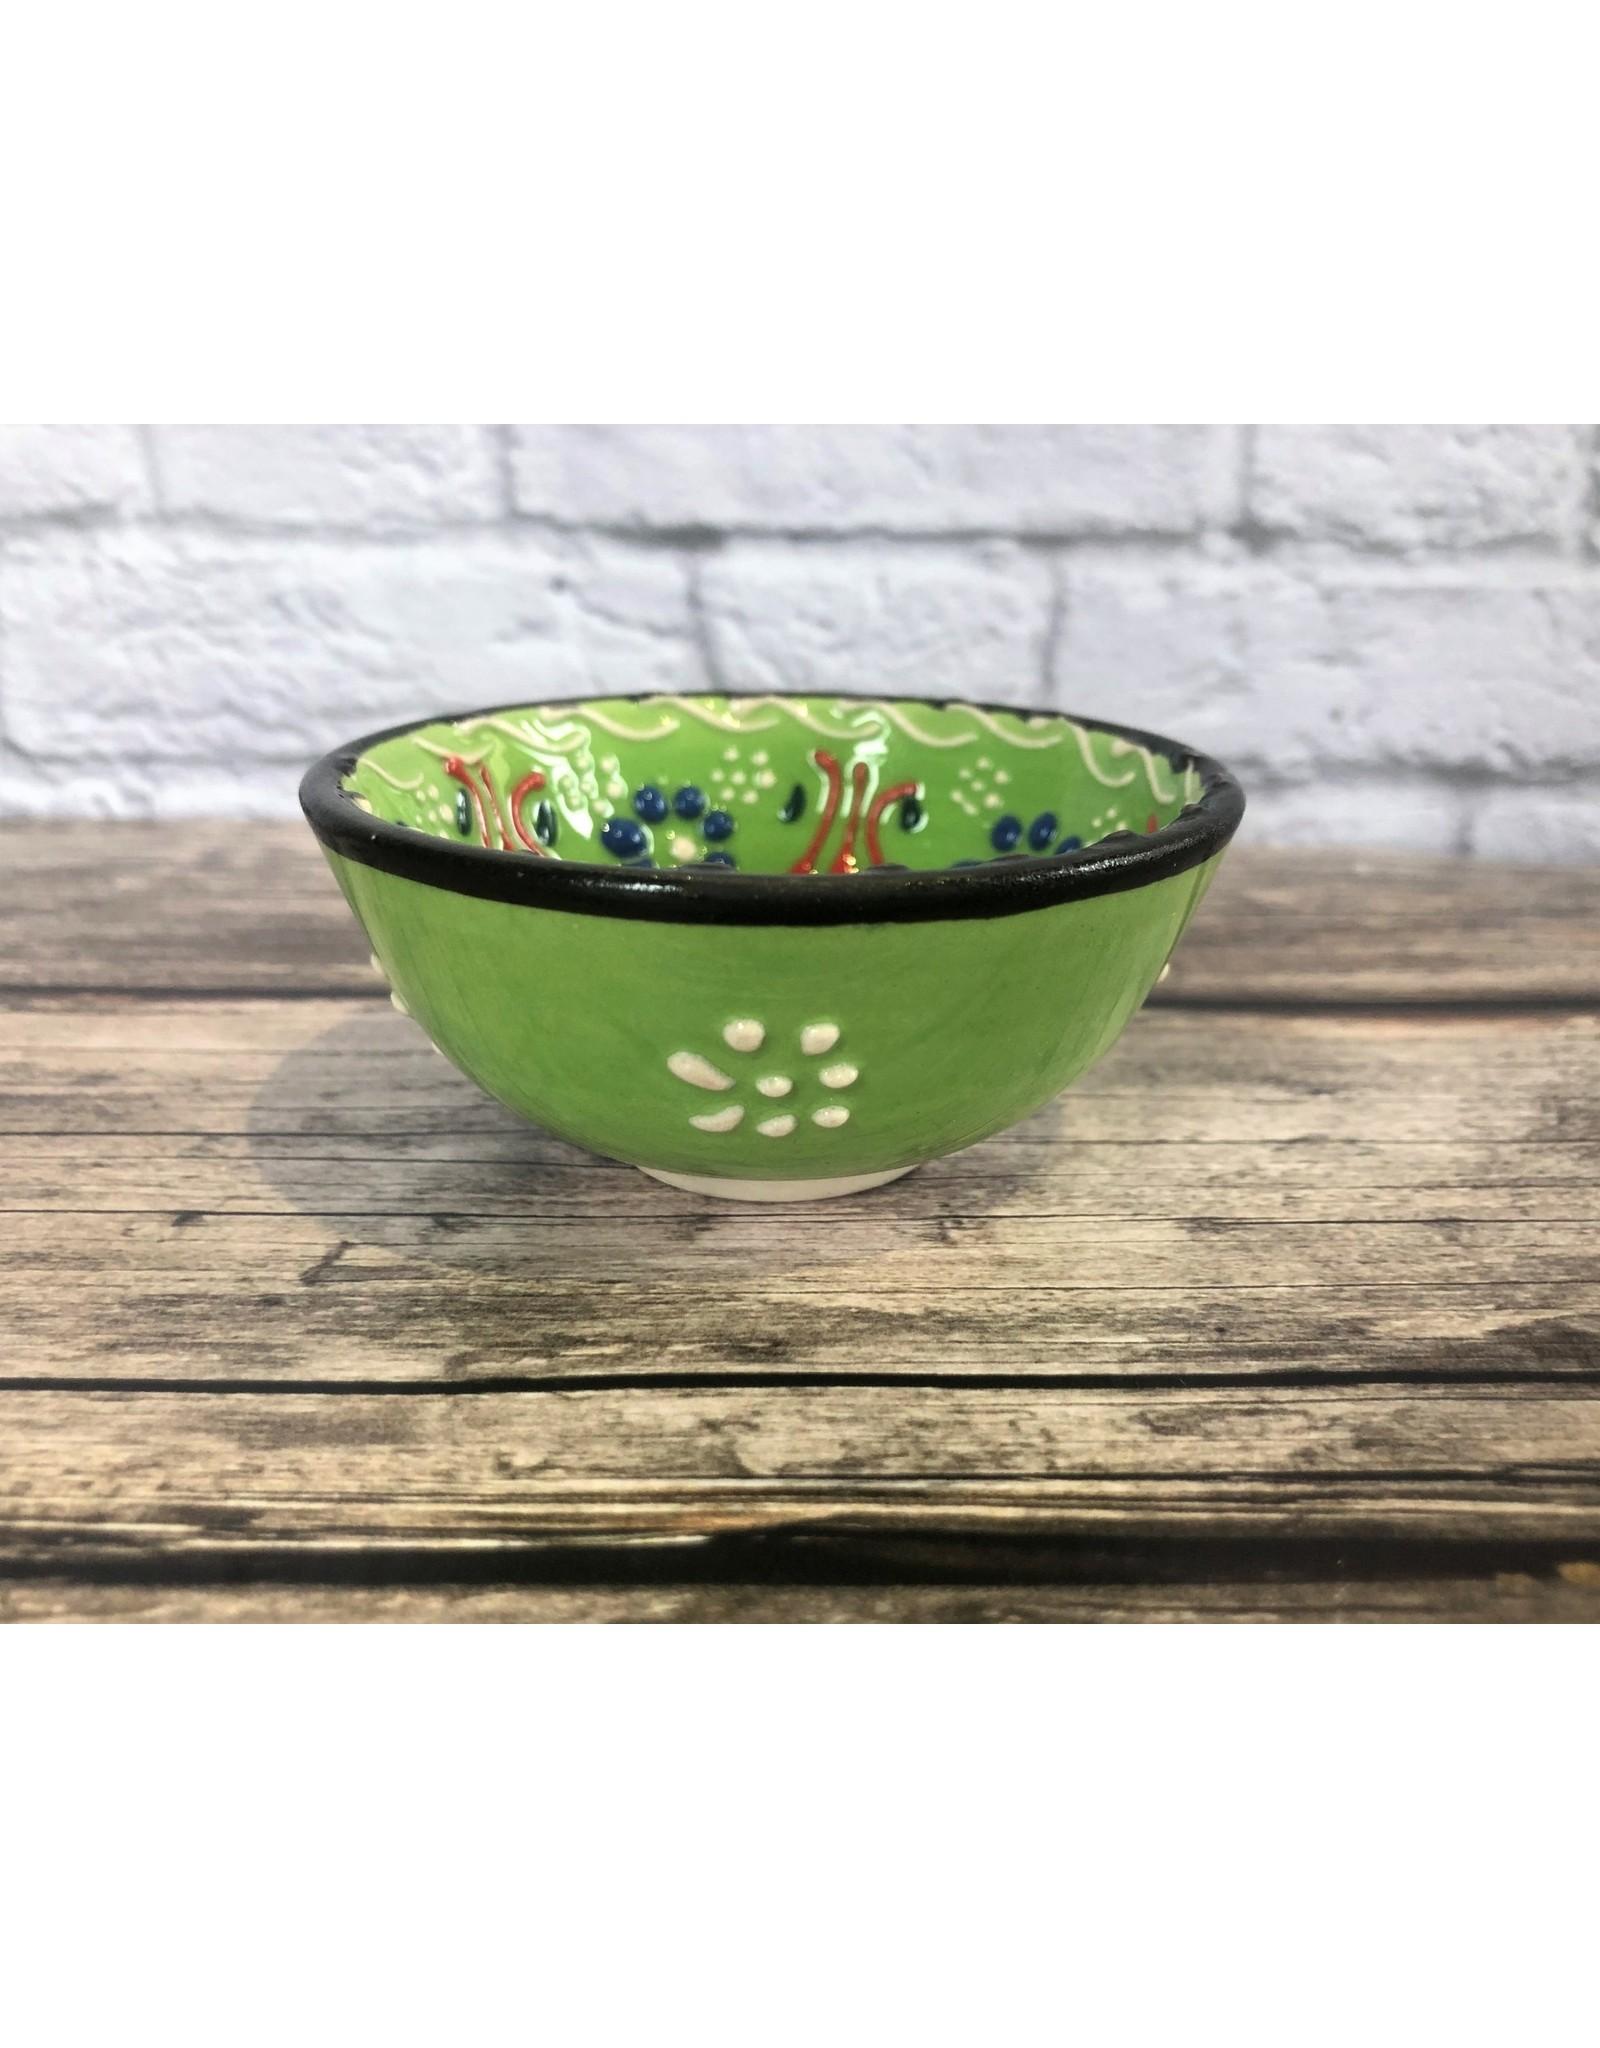 Black Sea Pottery Small Bowl in Green